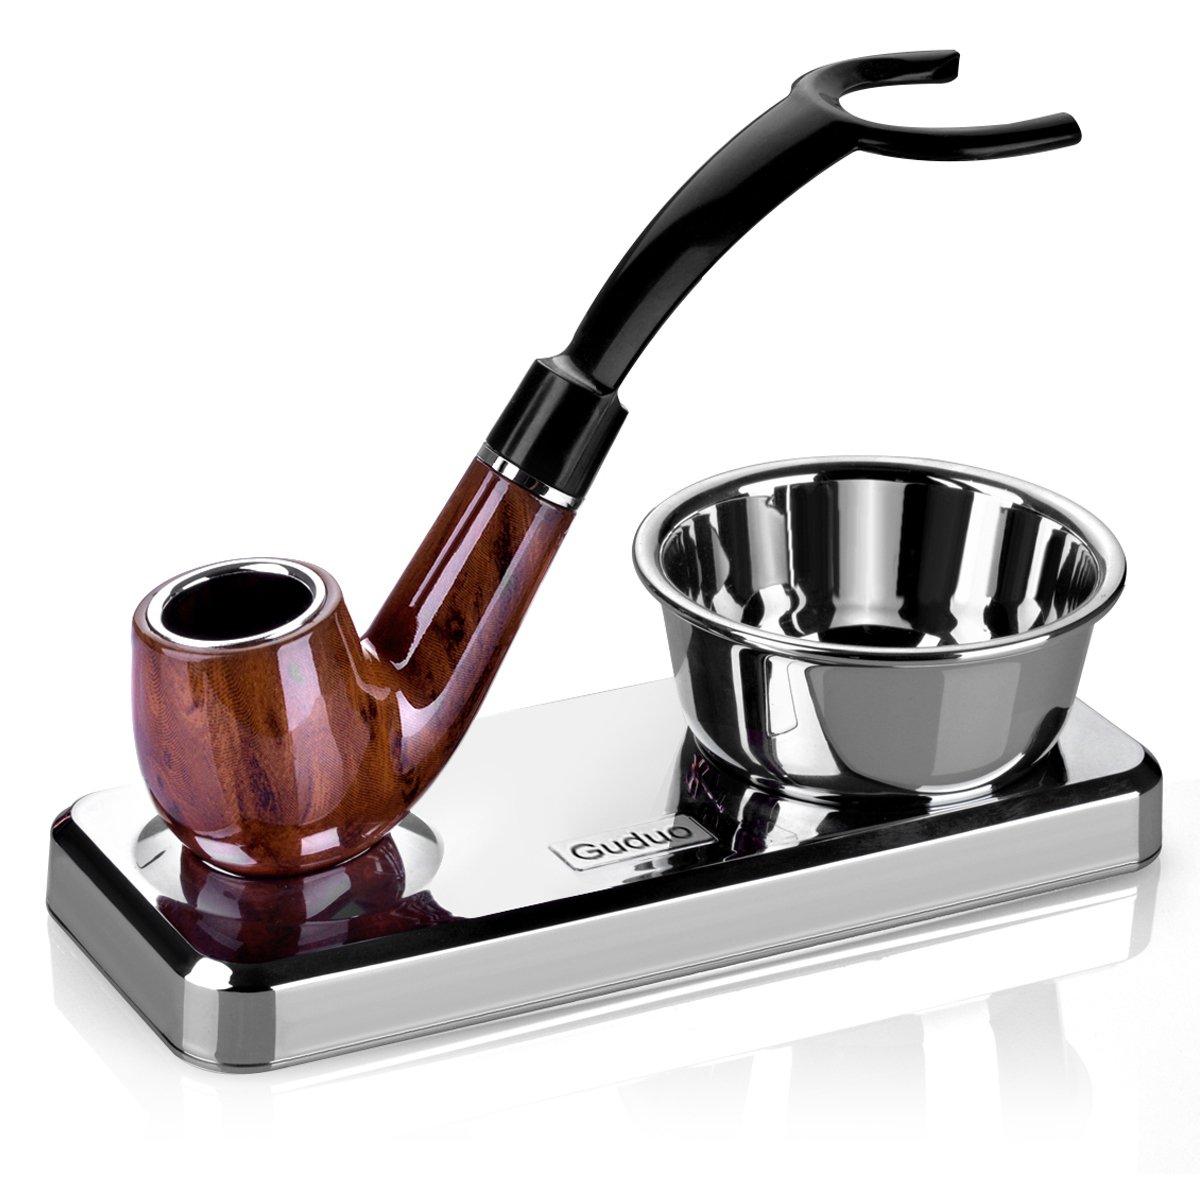 GUDUO Compatible Shaving Kit Deluxe Chrome Razor and Brush - Best Design Razor Stand with Razor Brush Blades and Bowl Stand (Black)